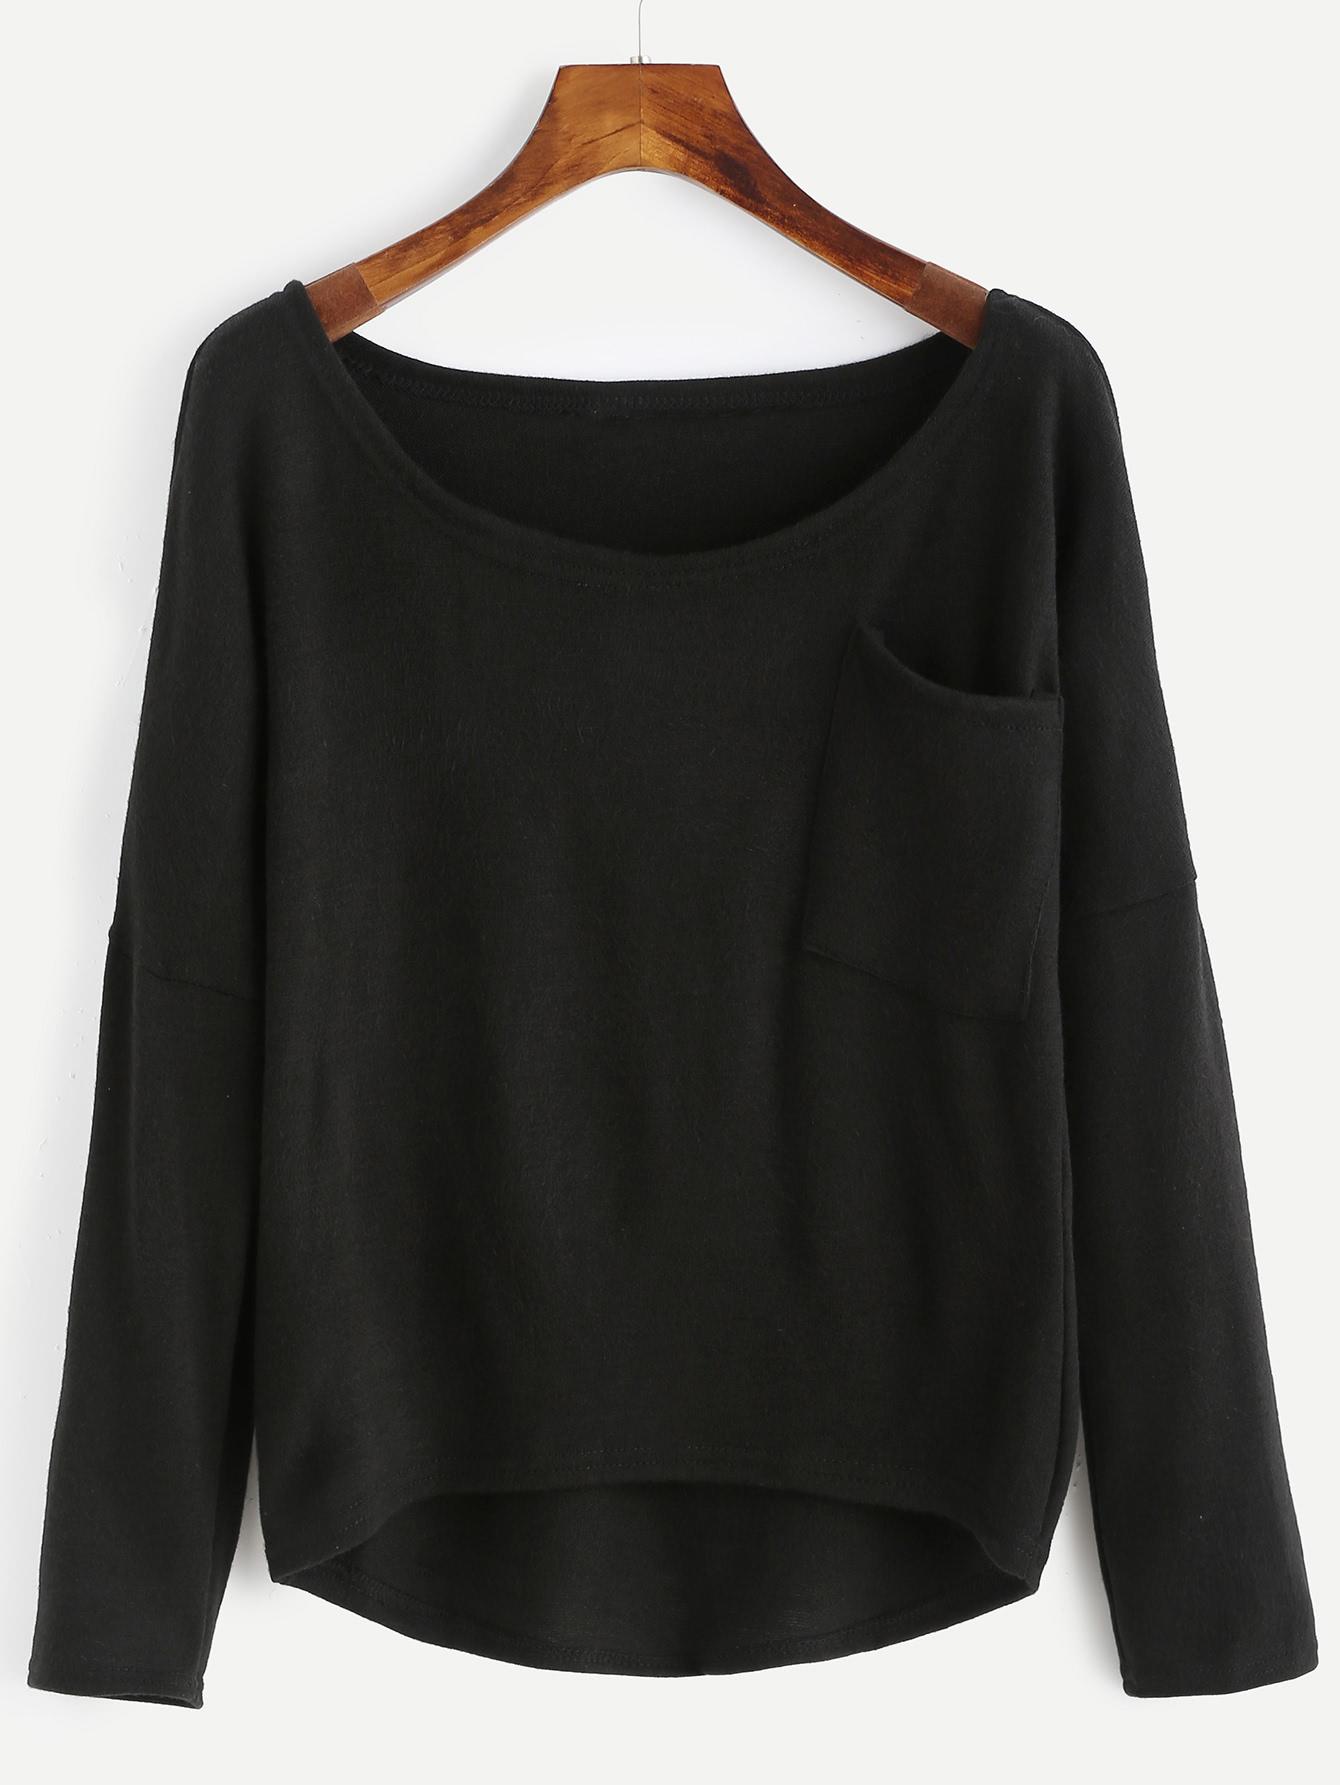 Front Pocket High Low Knitwear sweater160822003